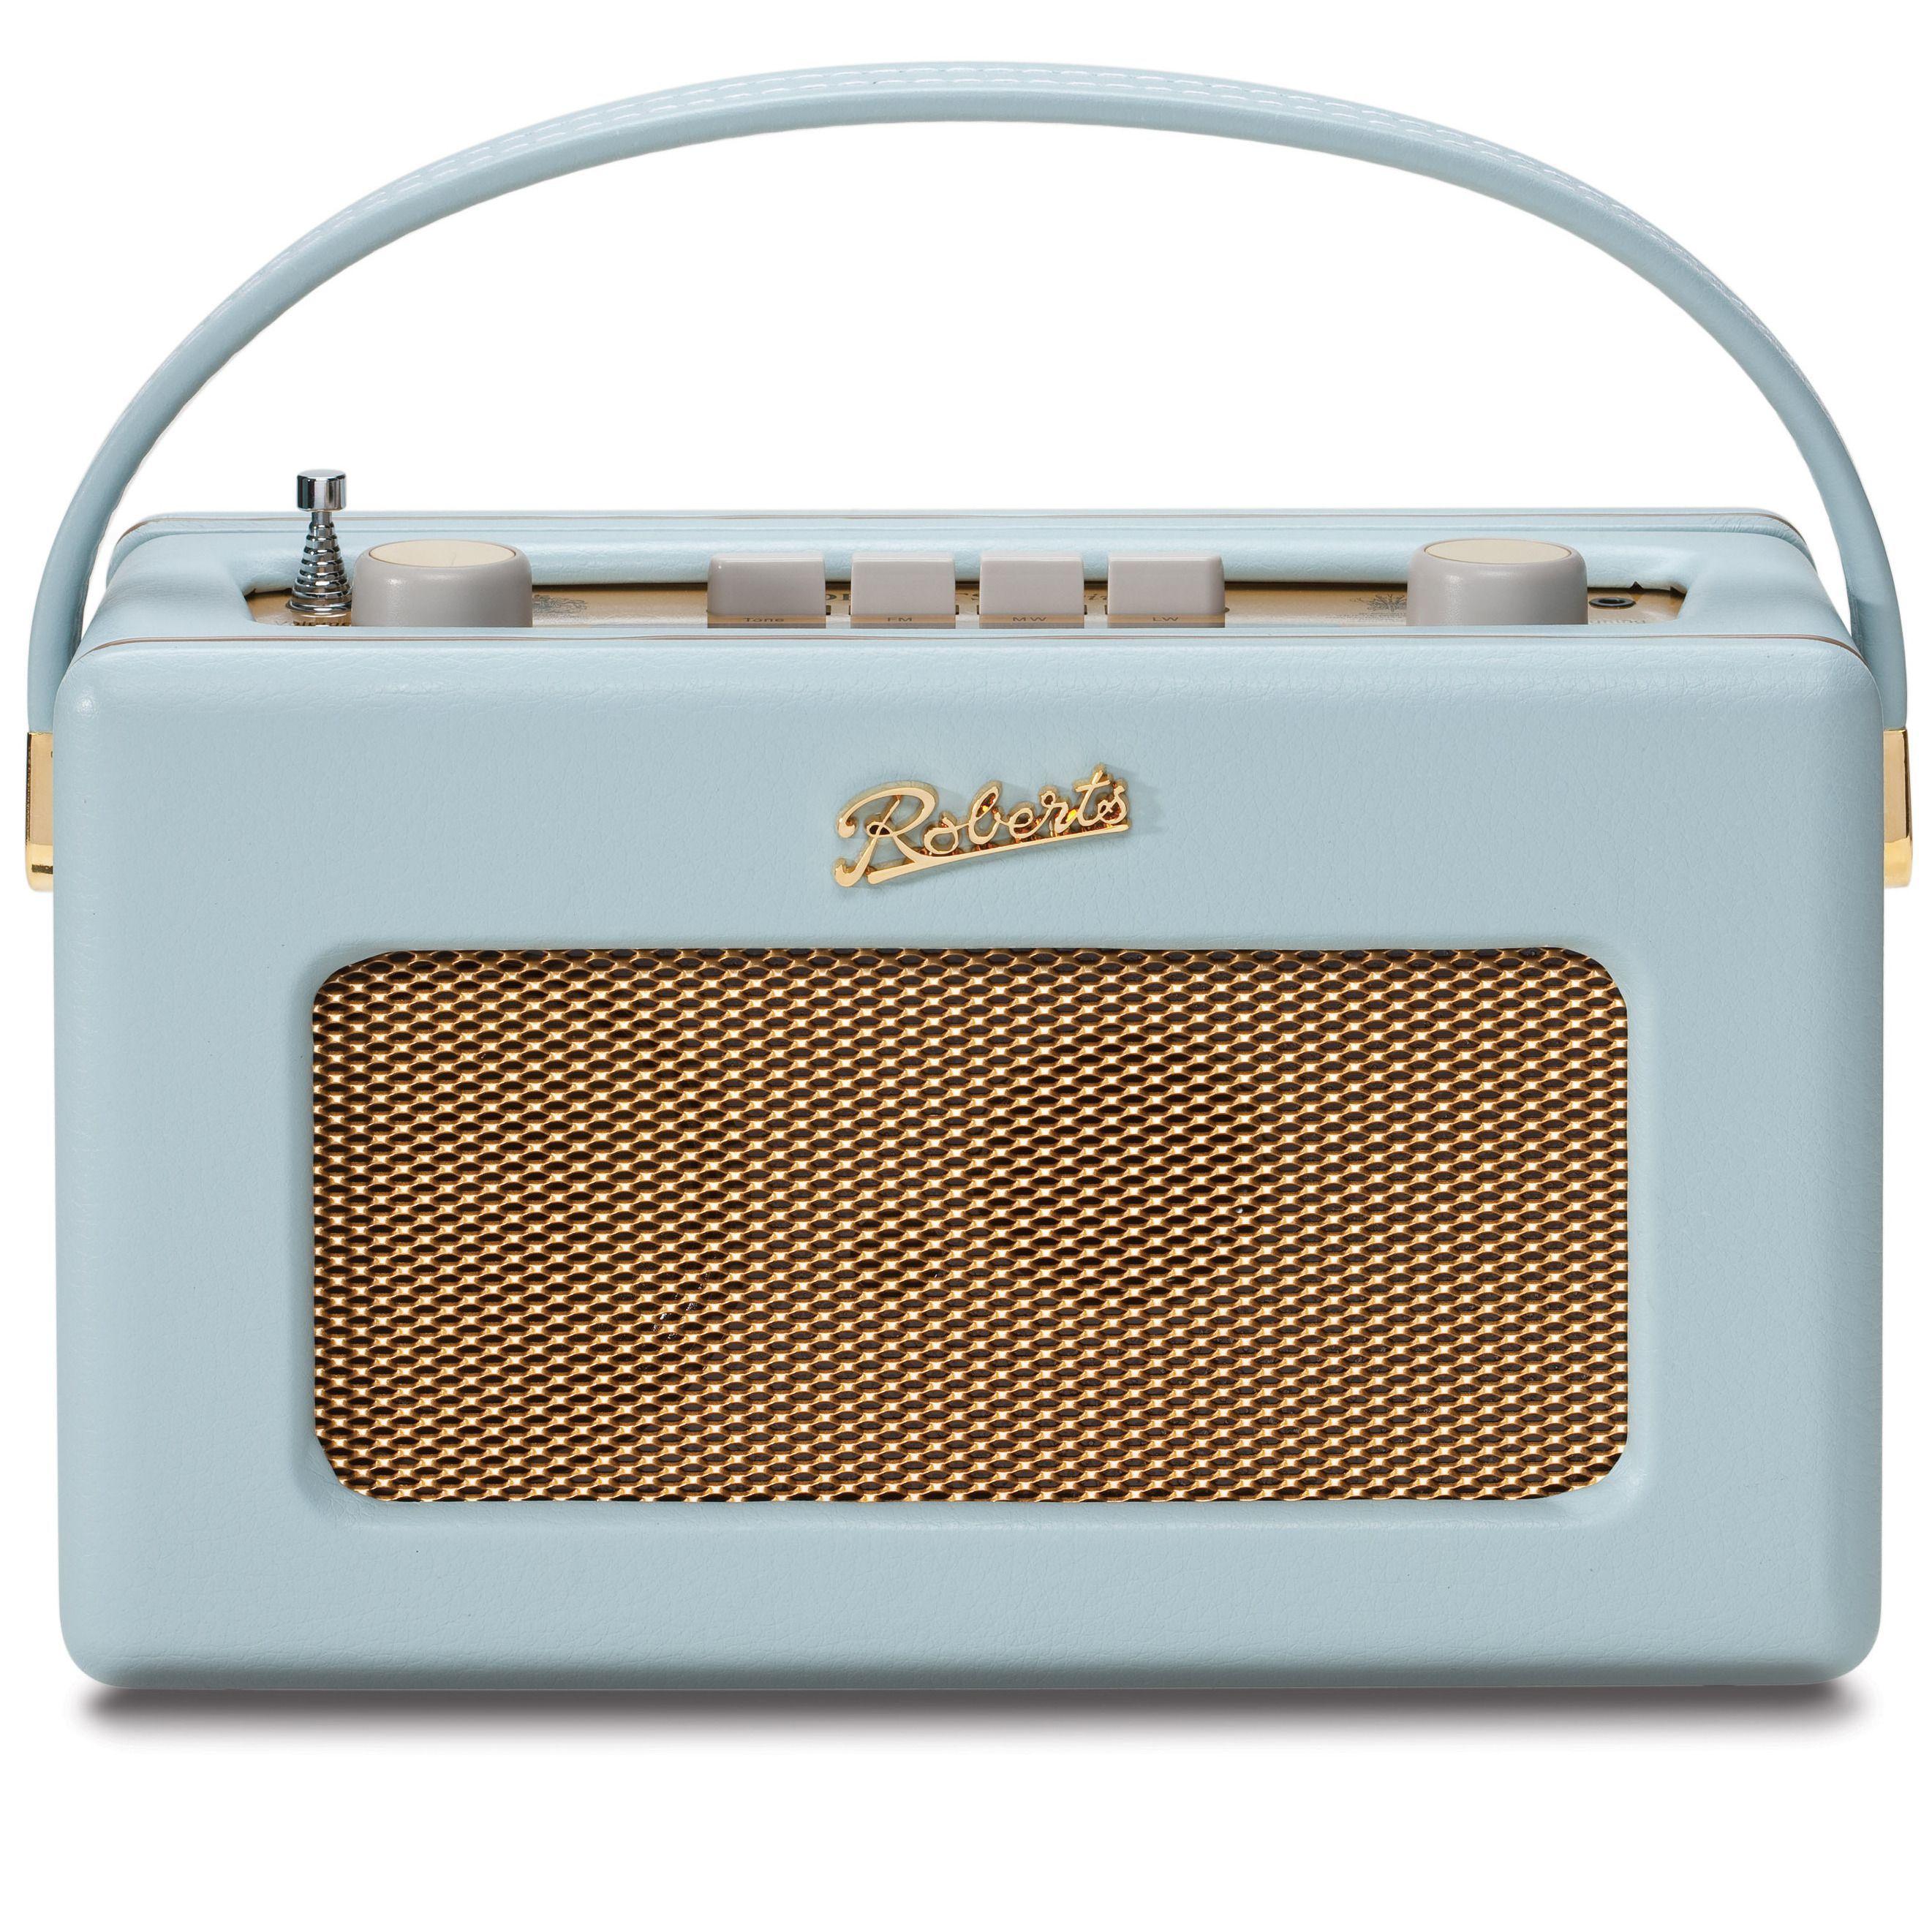 Robert\'s Radio 1950\'s Style Duck Egg Blue Leather Finish Retro Radio ...